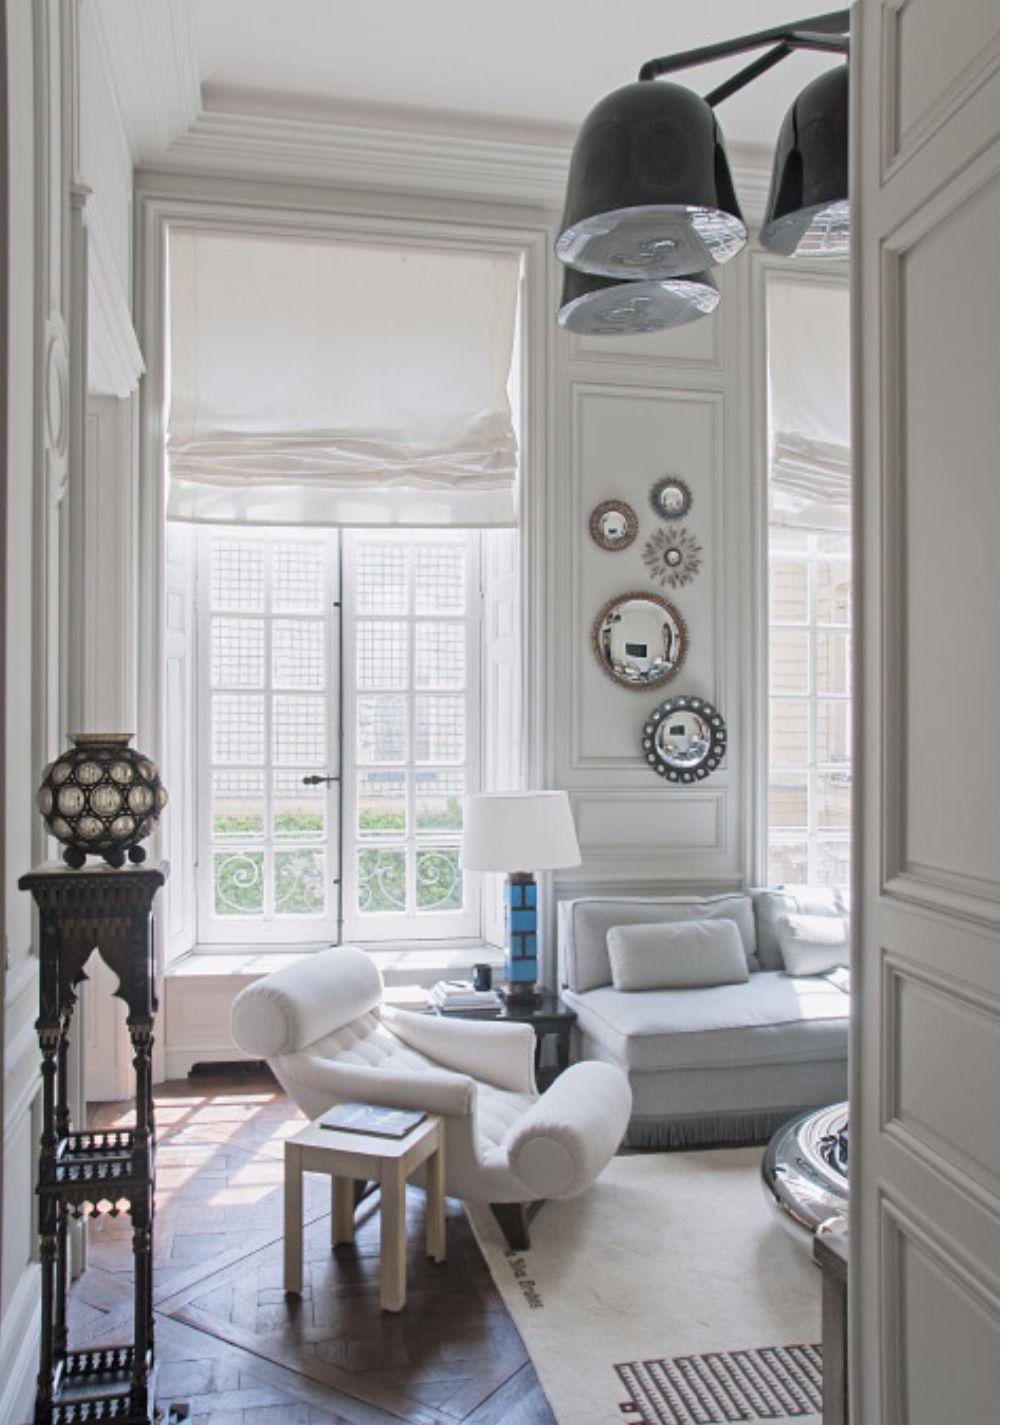 Pin by Jennifer Gray on Adroit Design 89 | Pinterest | Living rooms ...